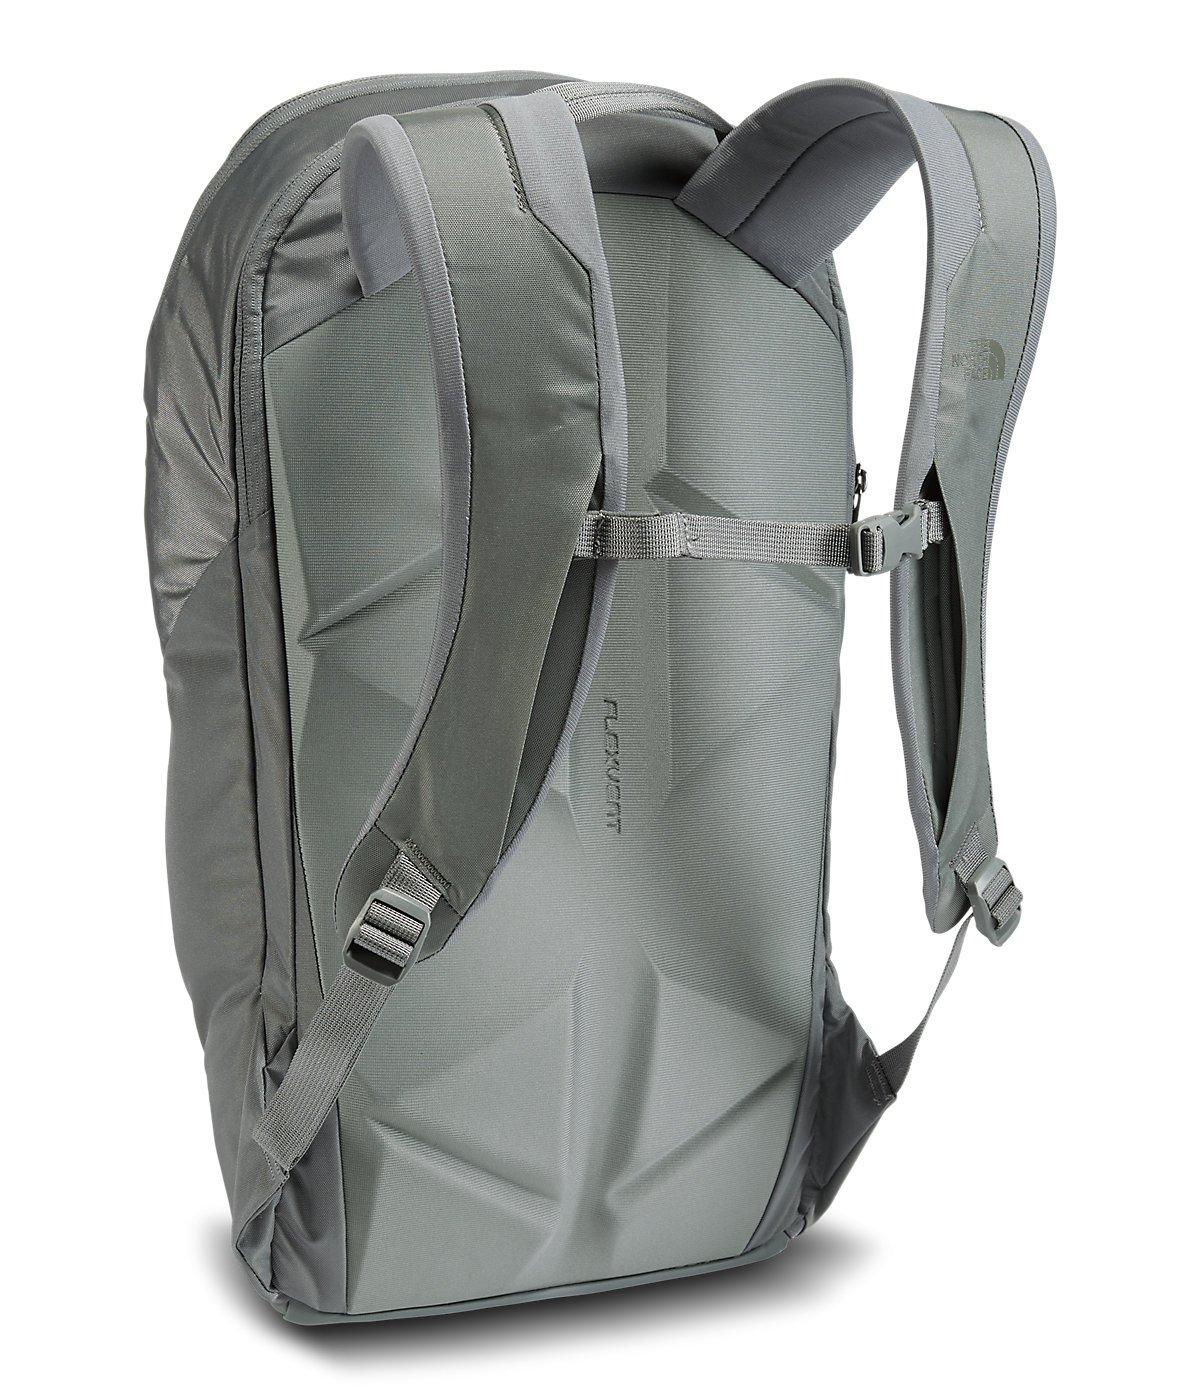 3f6a0e39e The North Face Kabyte Backpack Sedona Sage Grey: Amazon.ca: Luggage ...